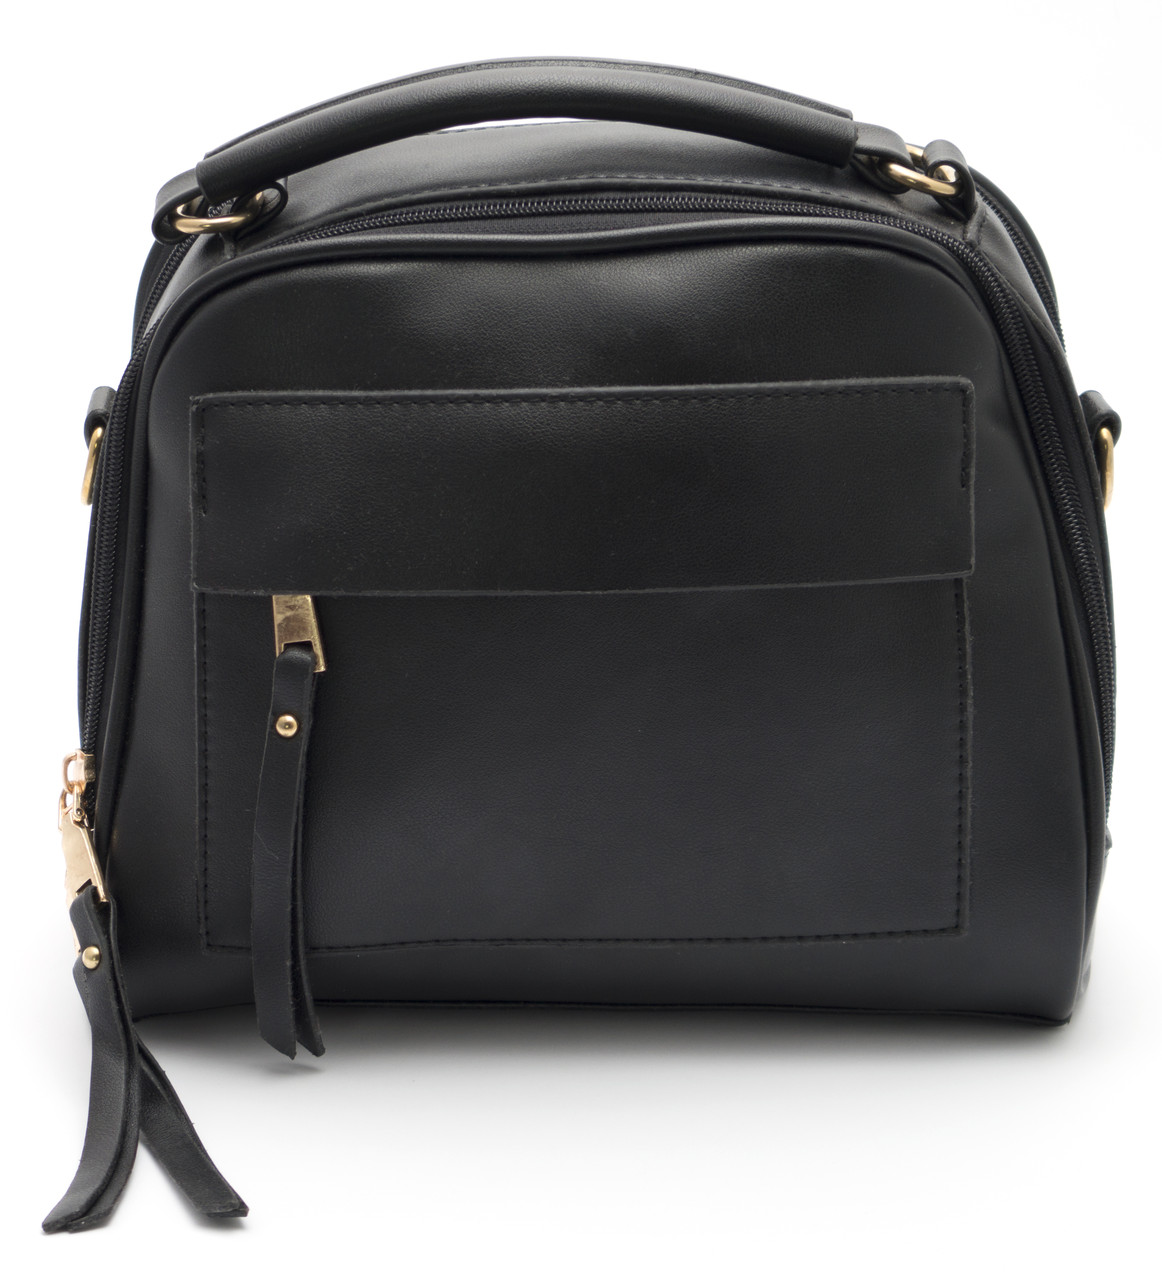 Аккуратная женская черная сумка  Б/Н art.027